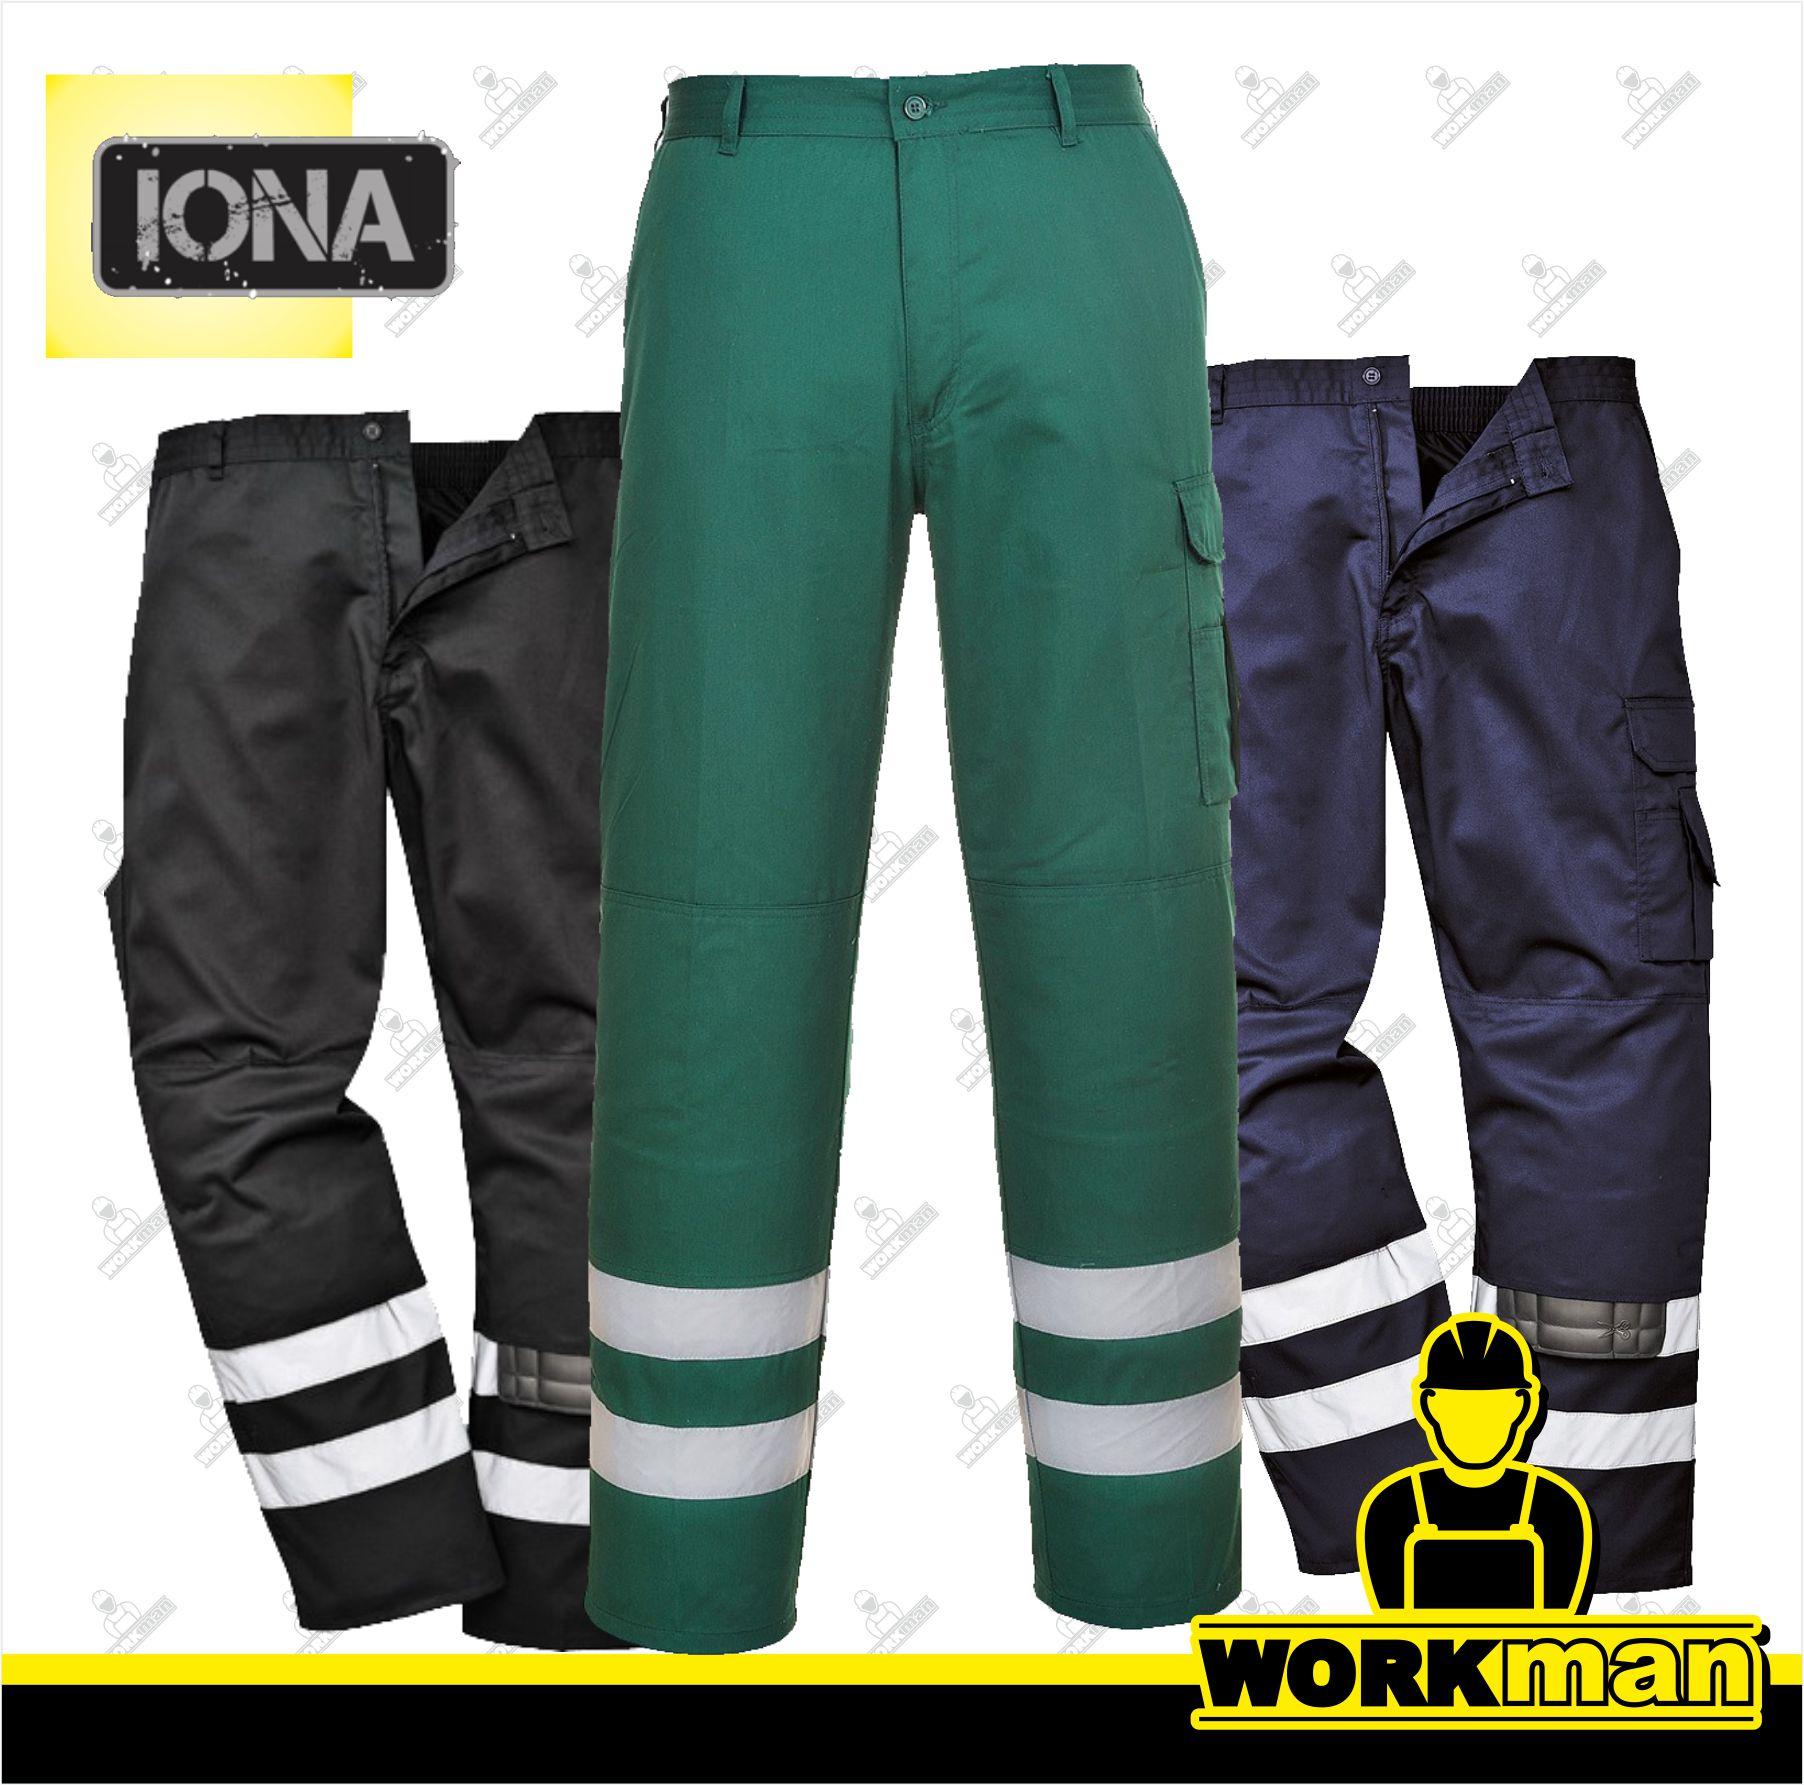 35d5566a65a5 Reflexné nohavice S917 PORTWEST IONA Pracovné odevy WORKMAN